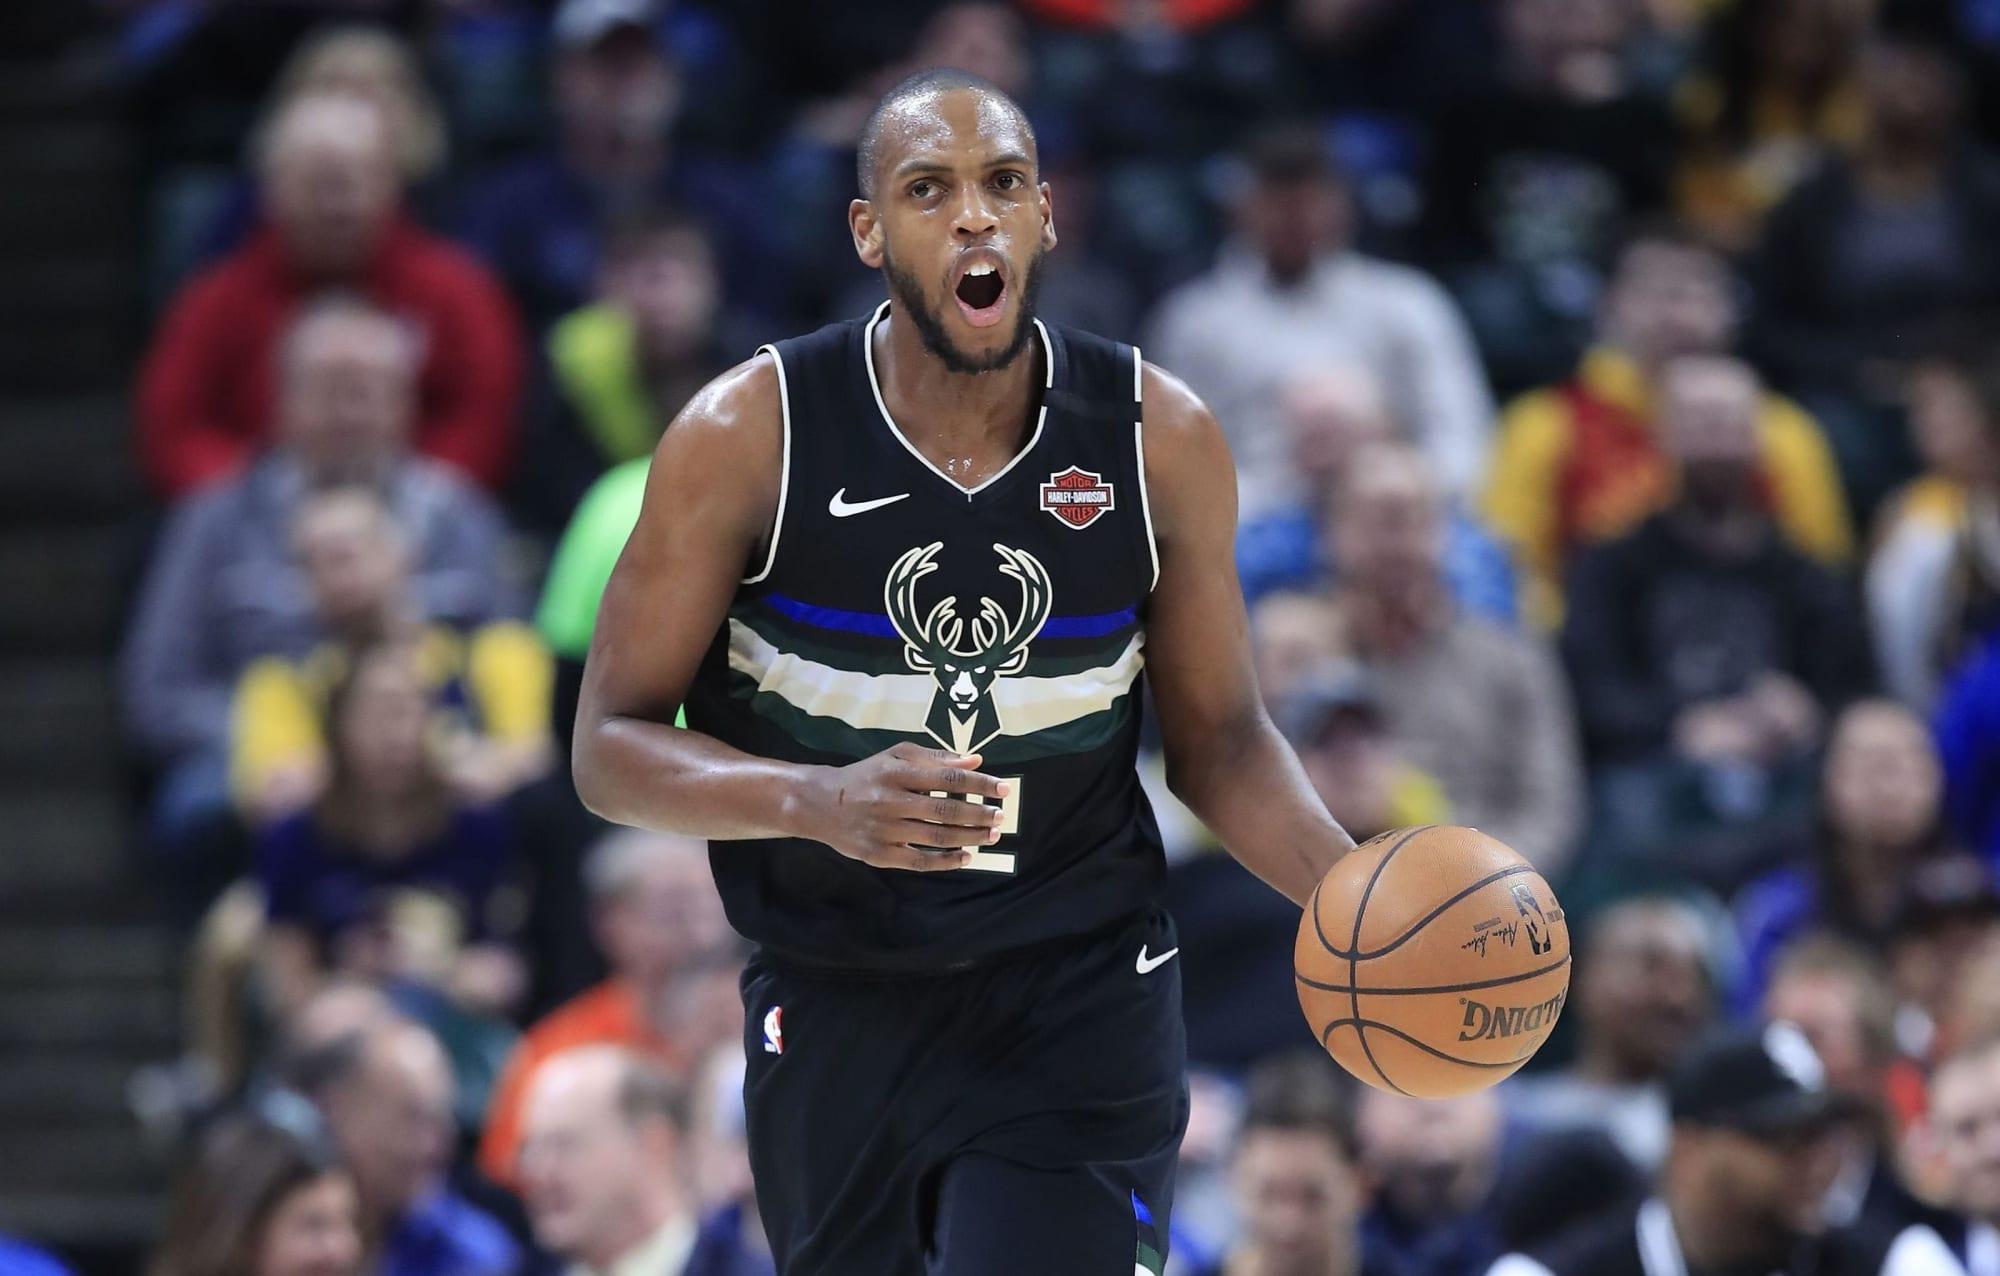 Milwaukee Bucks: Khris Middleton reflects on hiatus, gearing up for restart